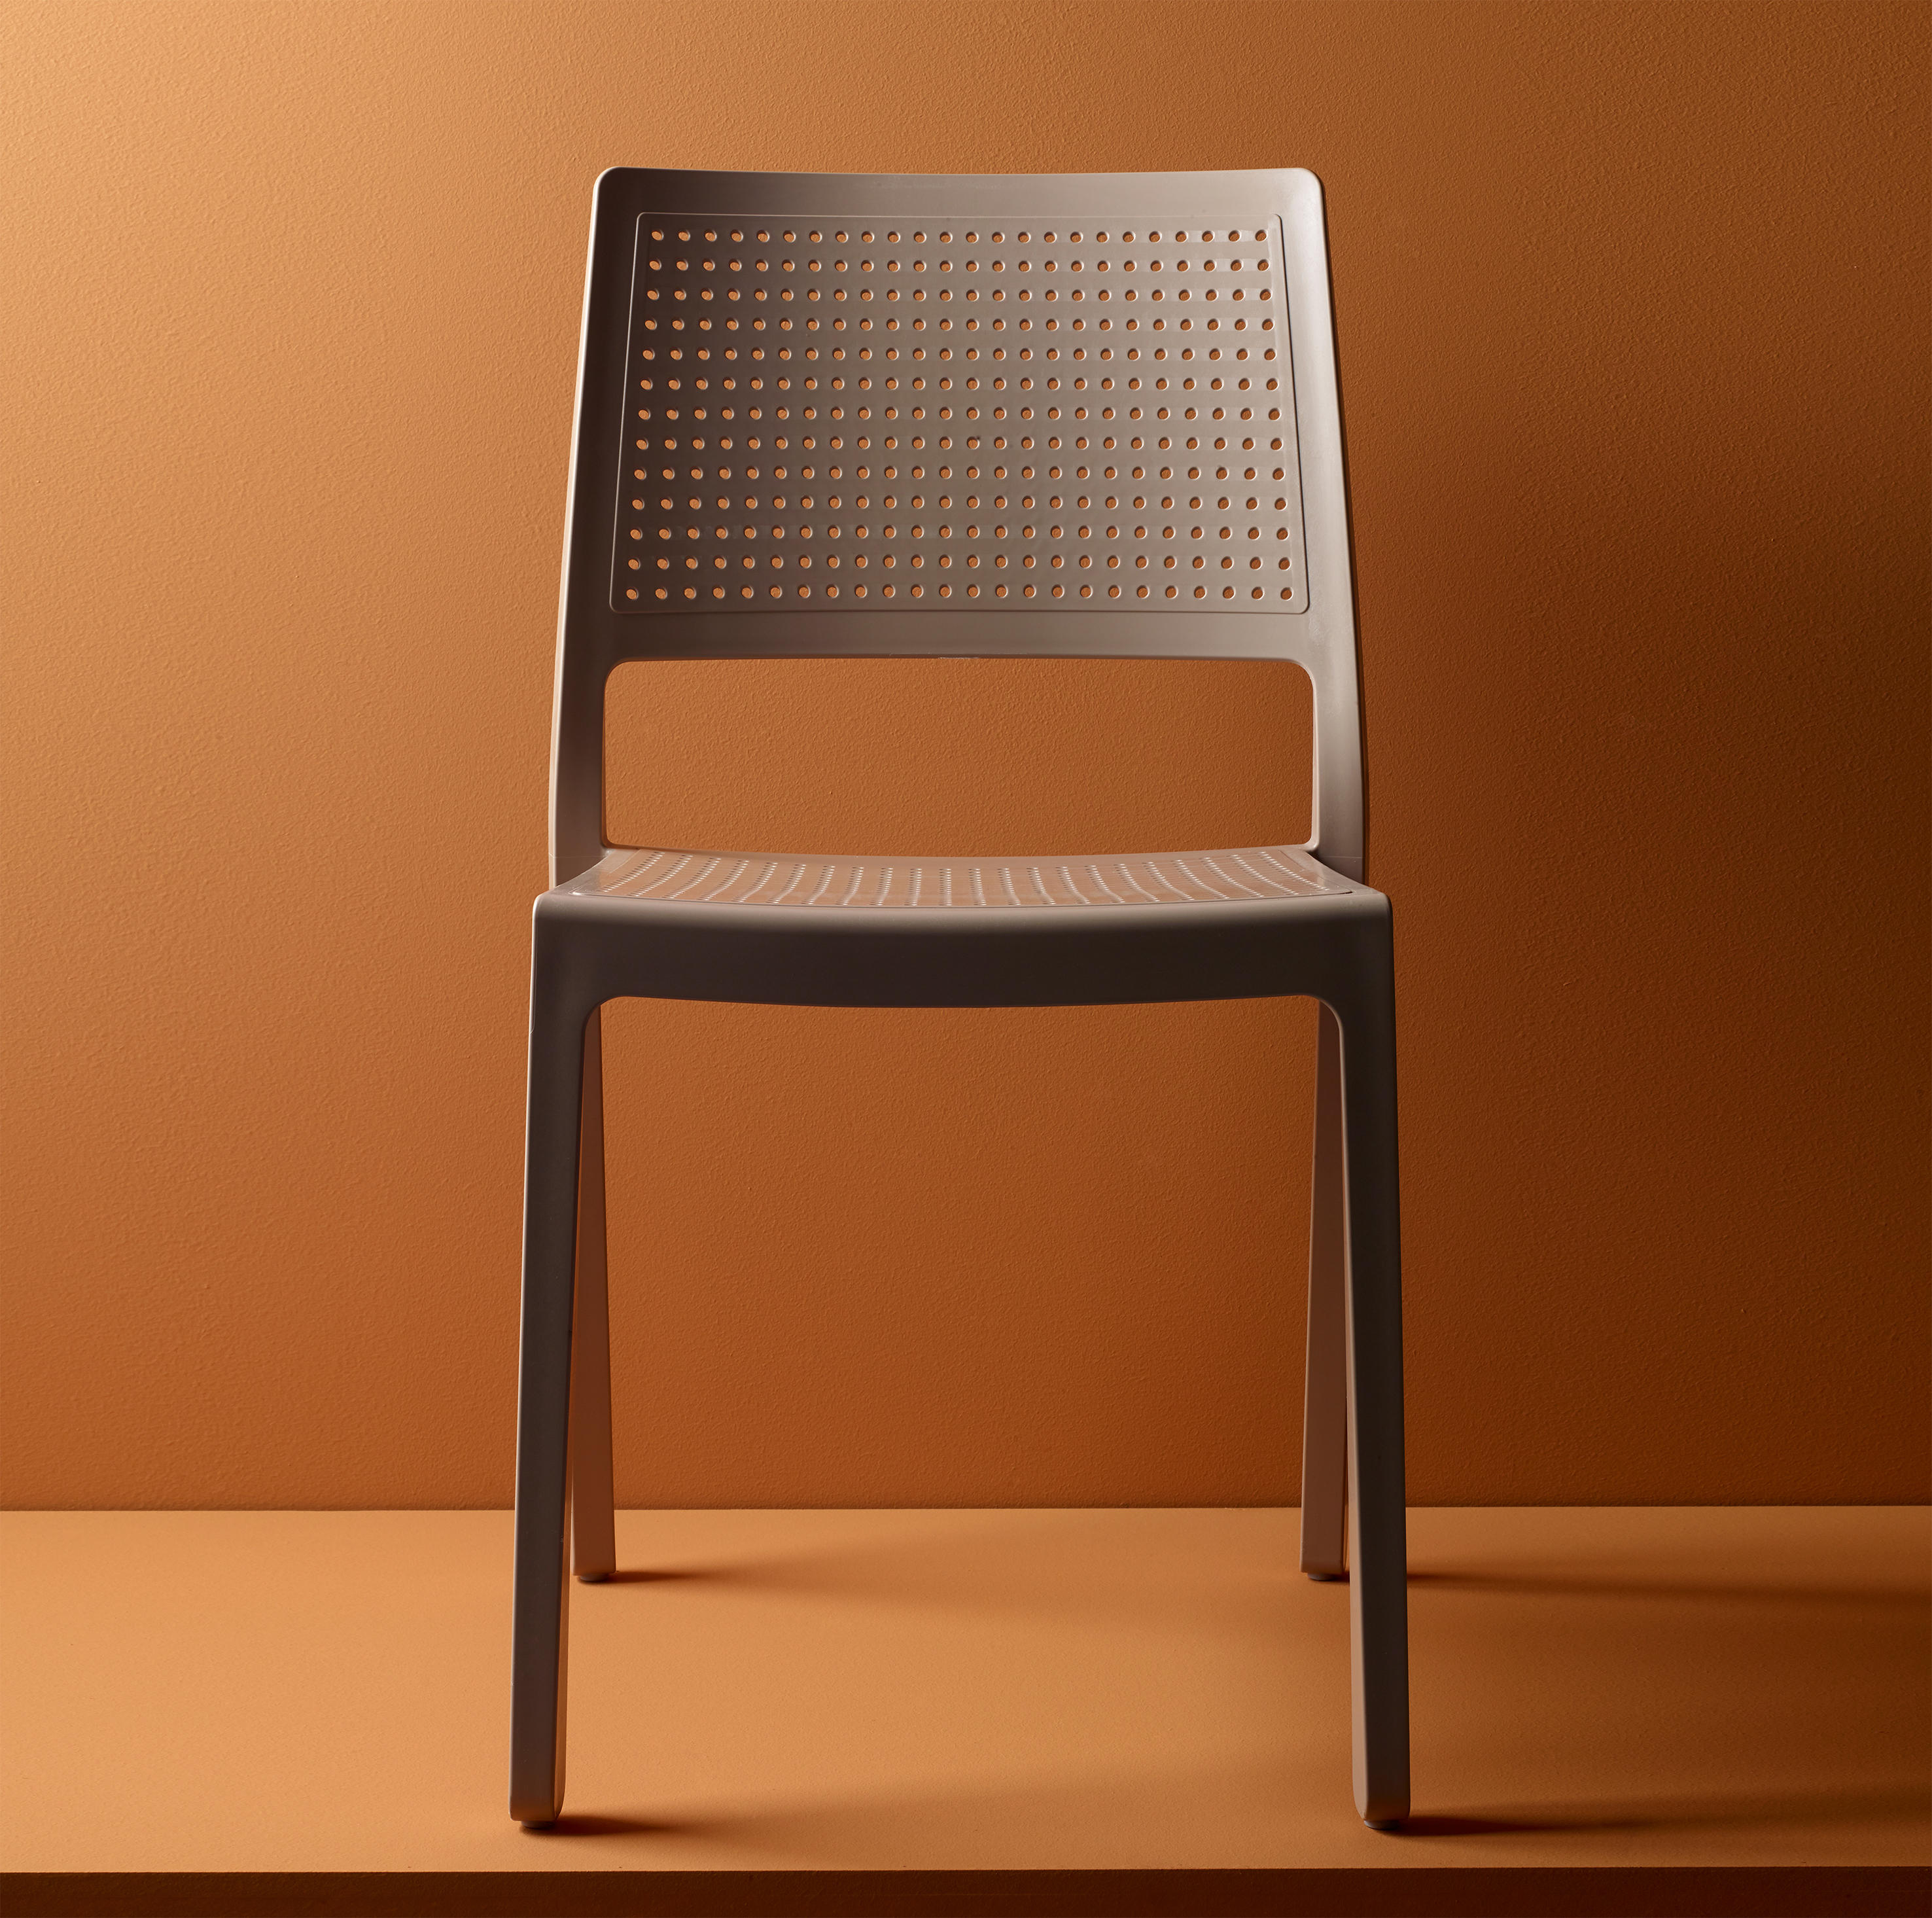 emi mehrzweckst hle von scab design architonic. Black Bedroom Furniture Sets. Home Design Ideas